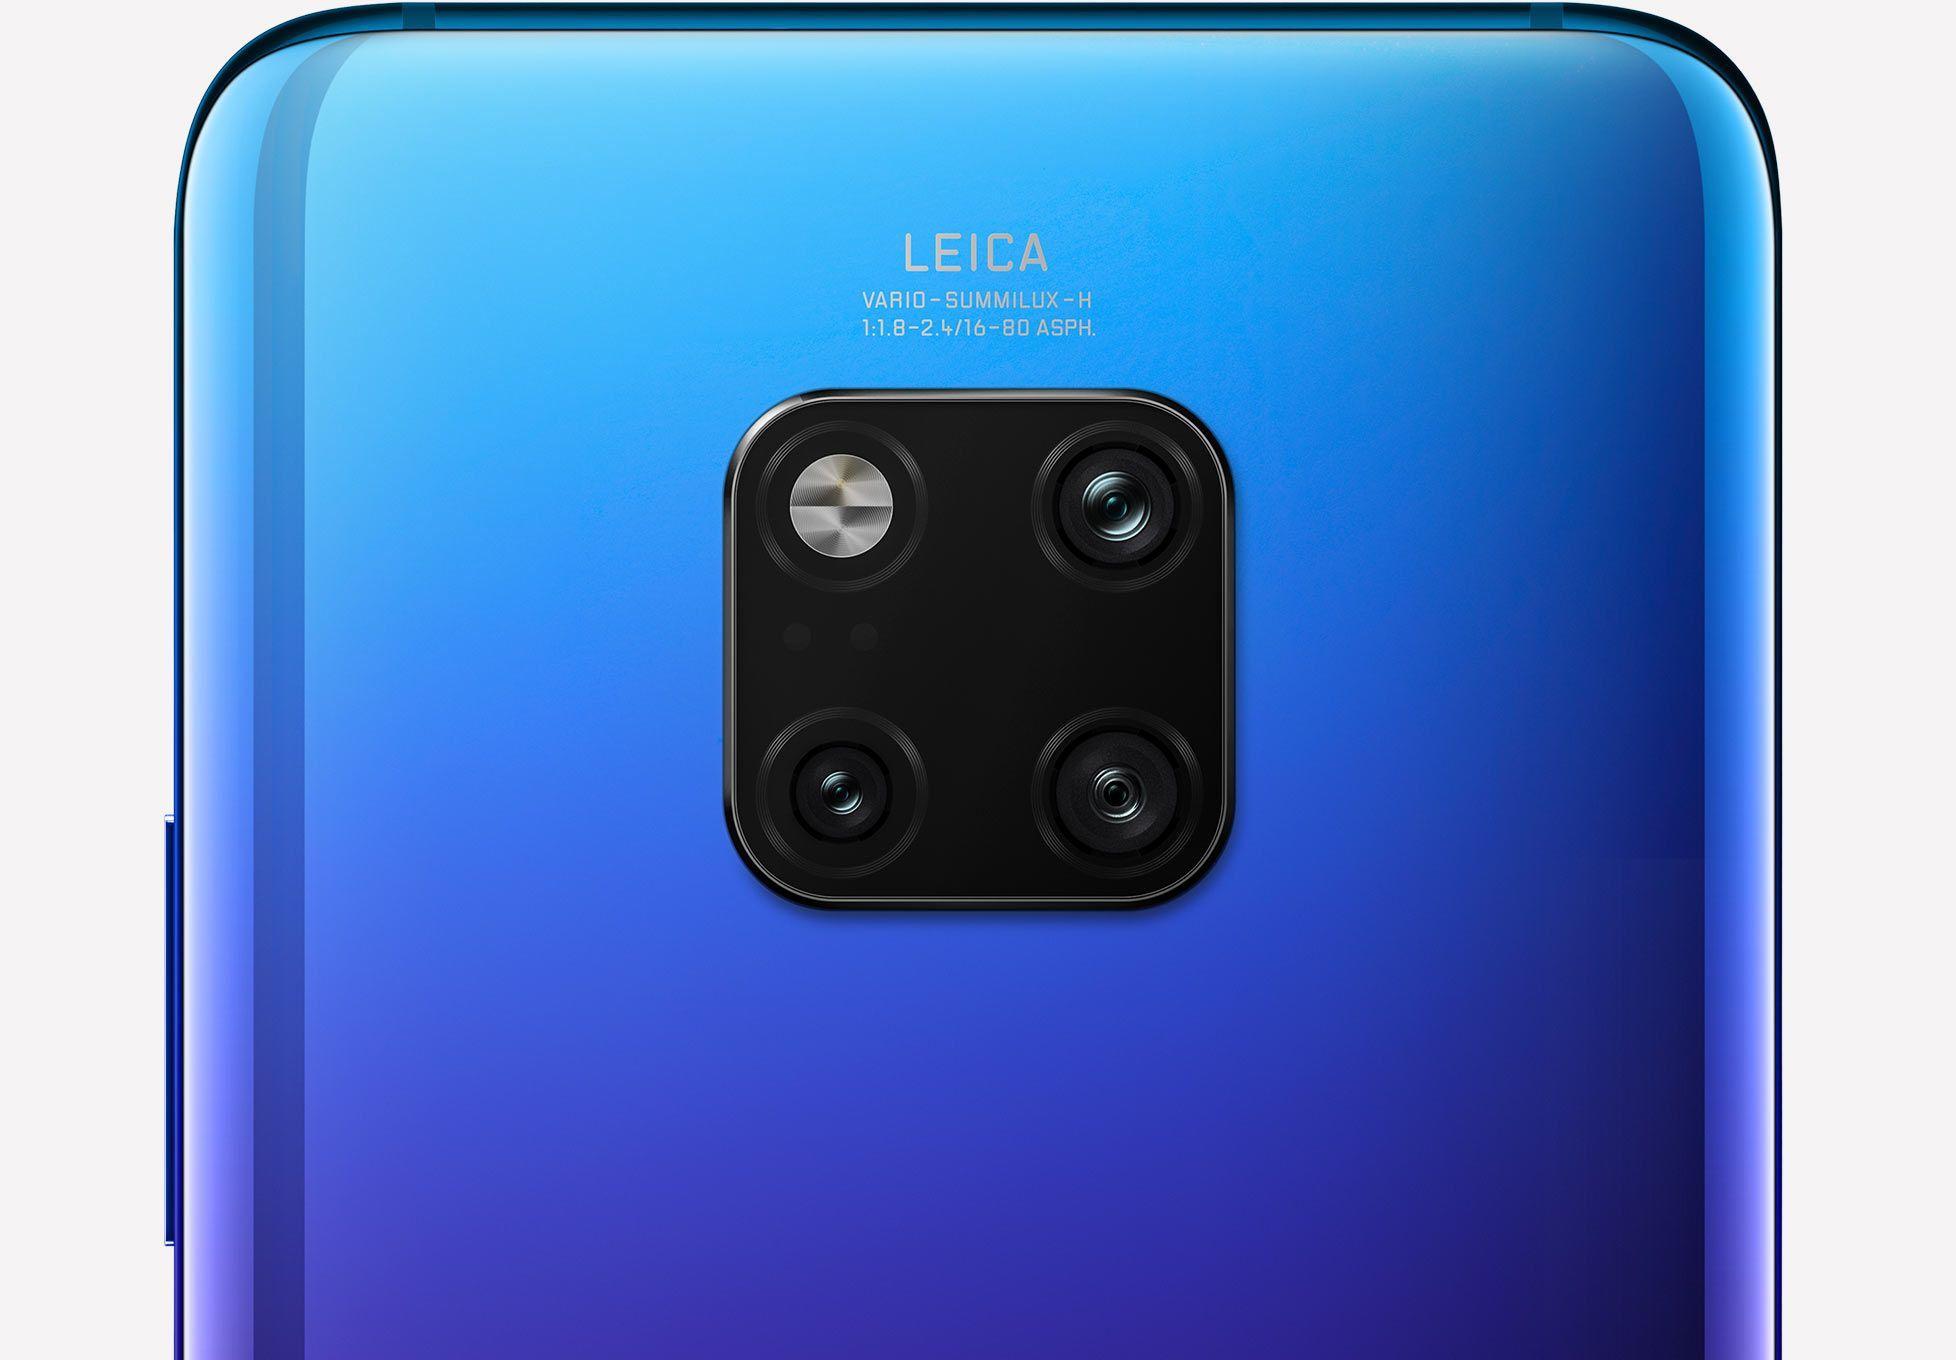 Huawei Mate 20 Pro Kirin 980 Leica Ultra Wide Lens Advanced Ai Phone Huawei Malaysia Smartphone Huawei Cellular Phone